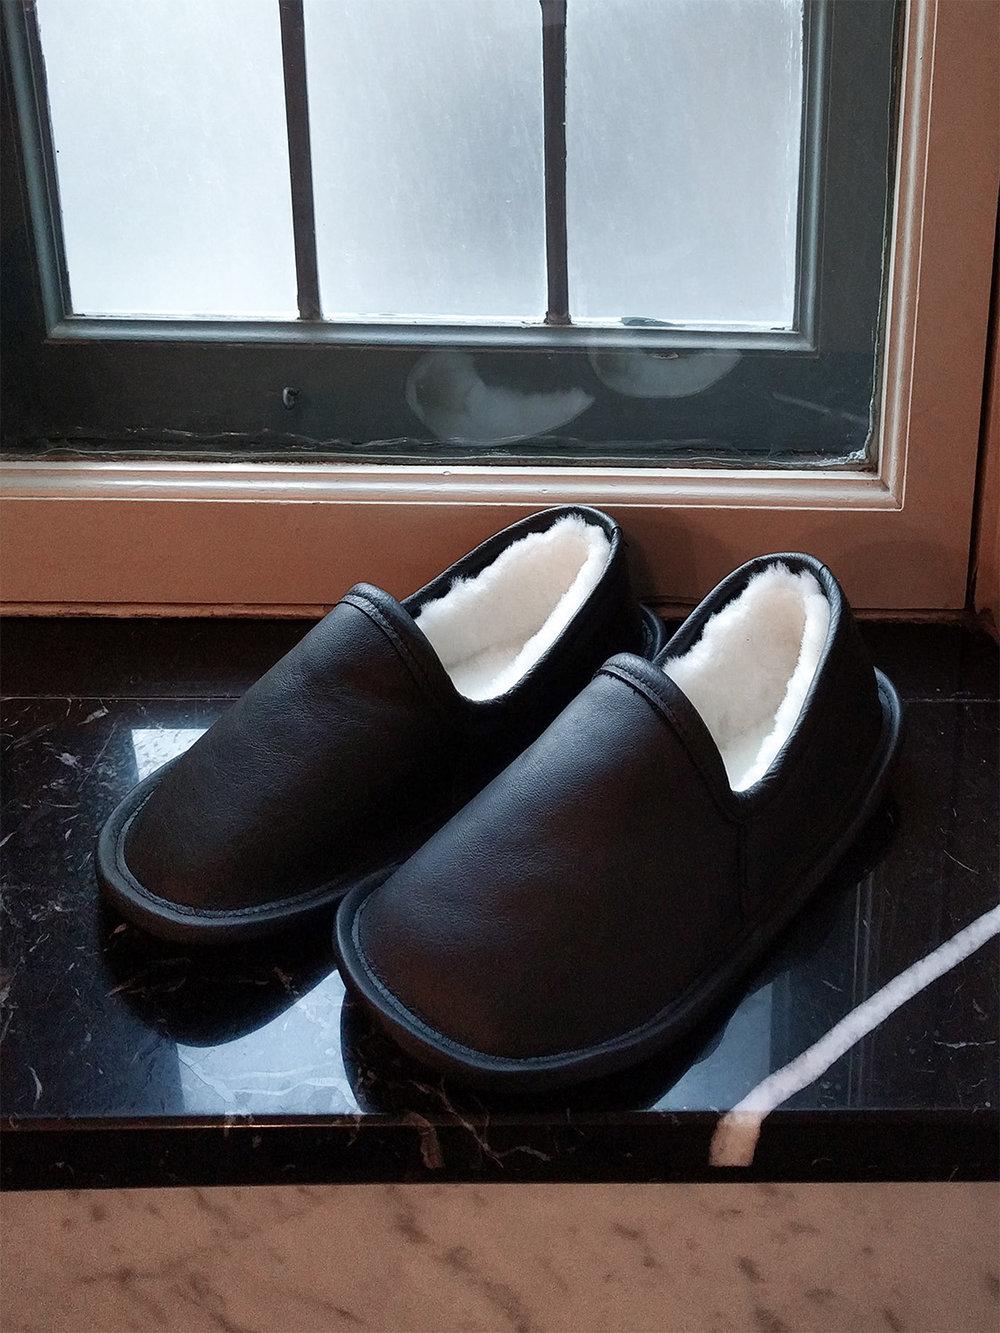 Pantoufles en cuir noir